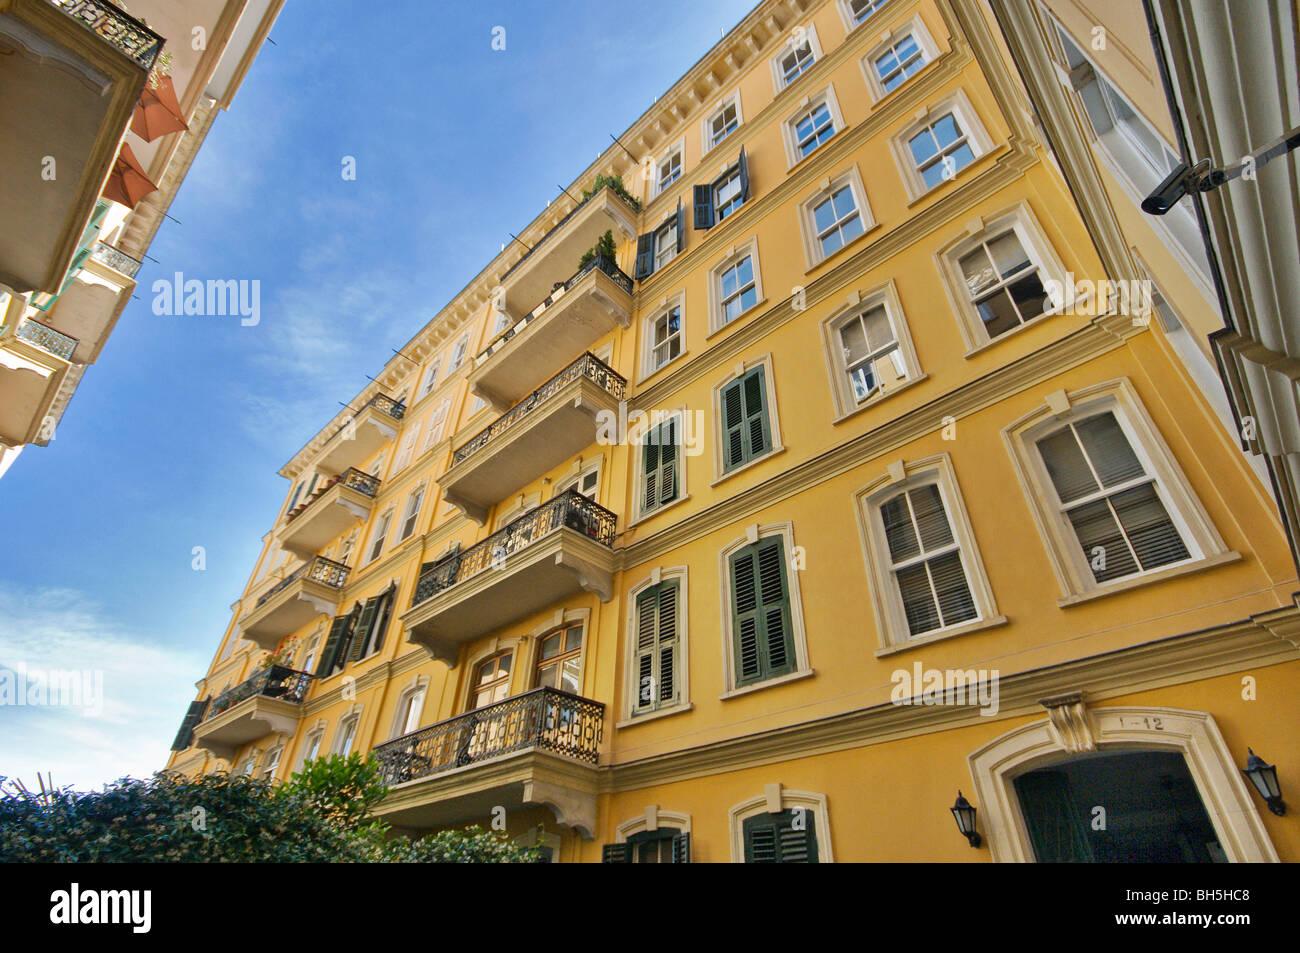 Dogan historique Immeuble du Galata Istanbul Turquie Photo Stock